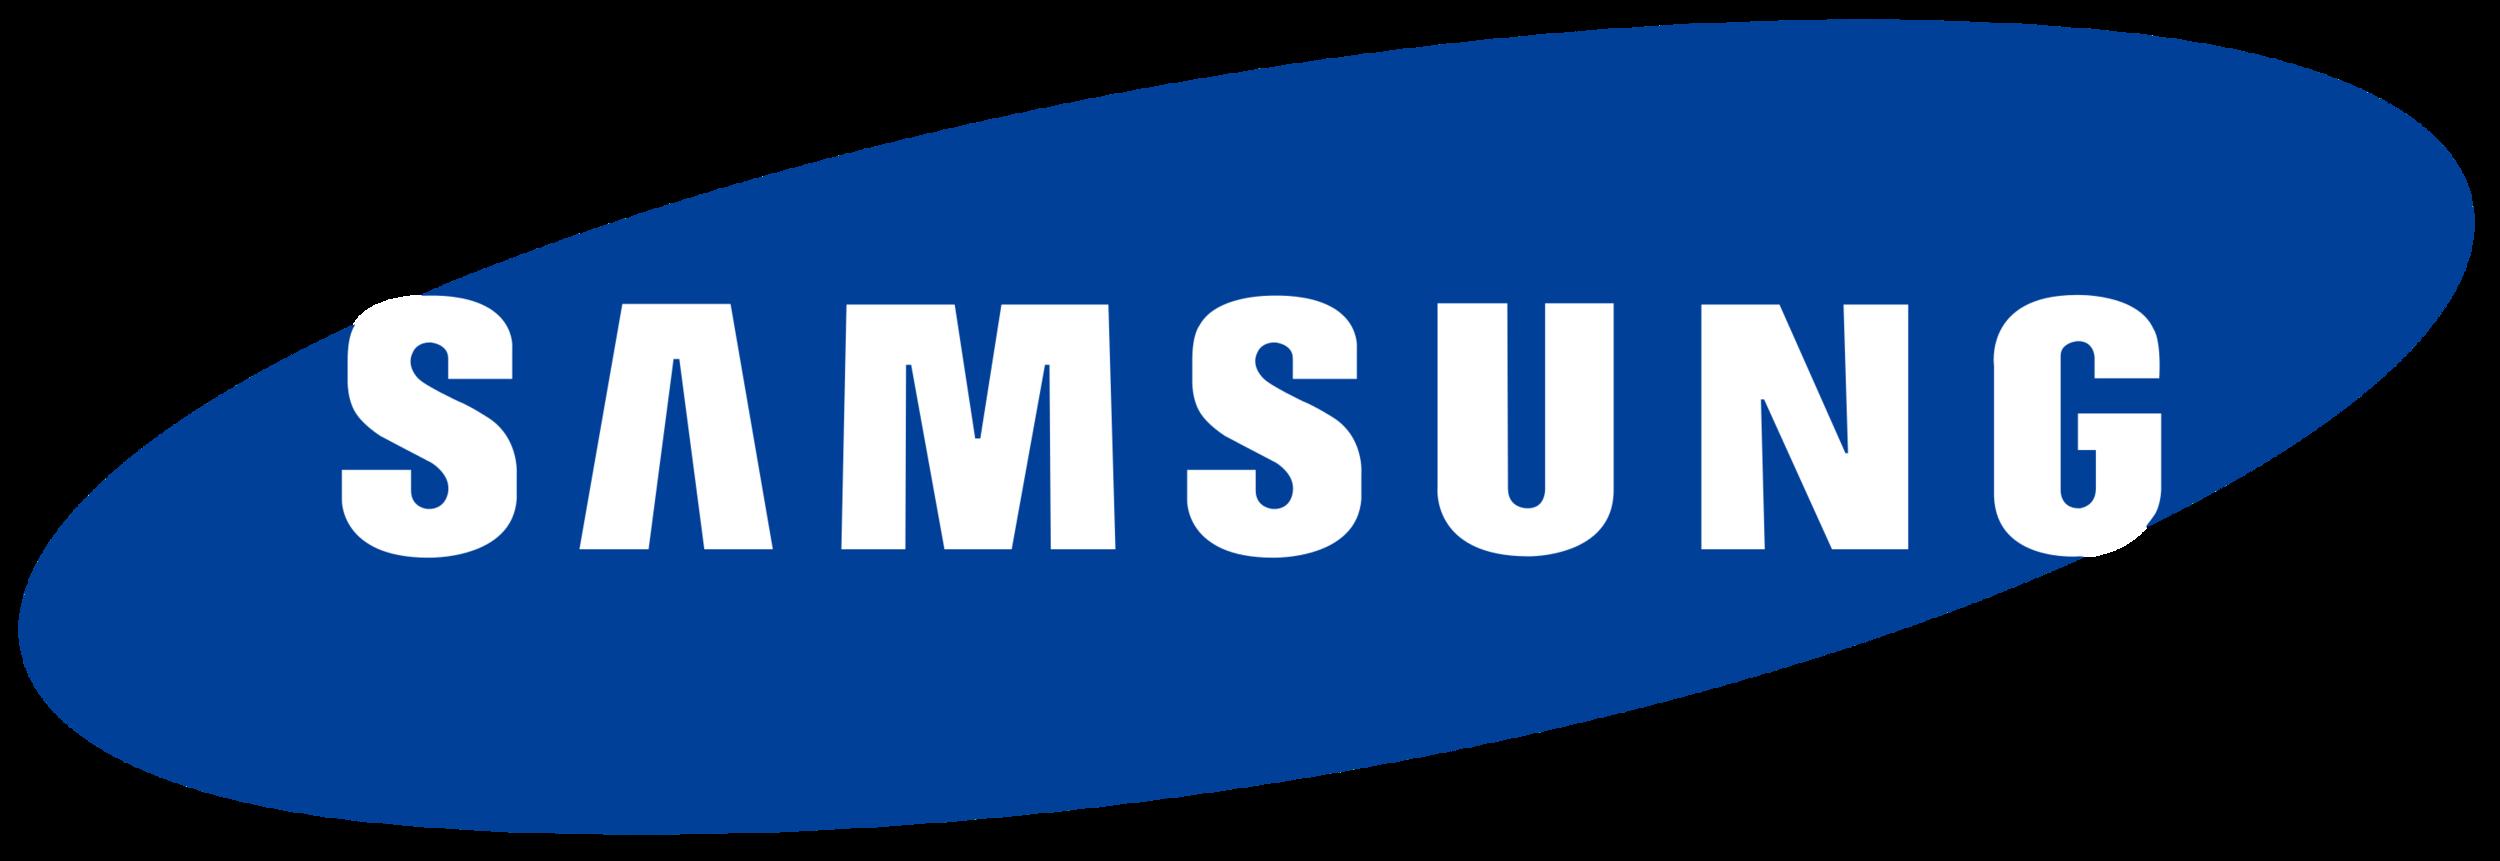 Samsung_Logo_Png_07.png